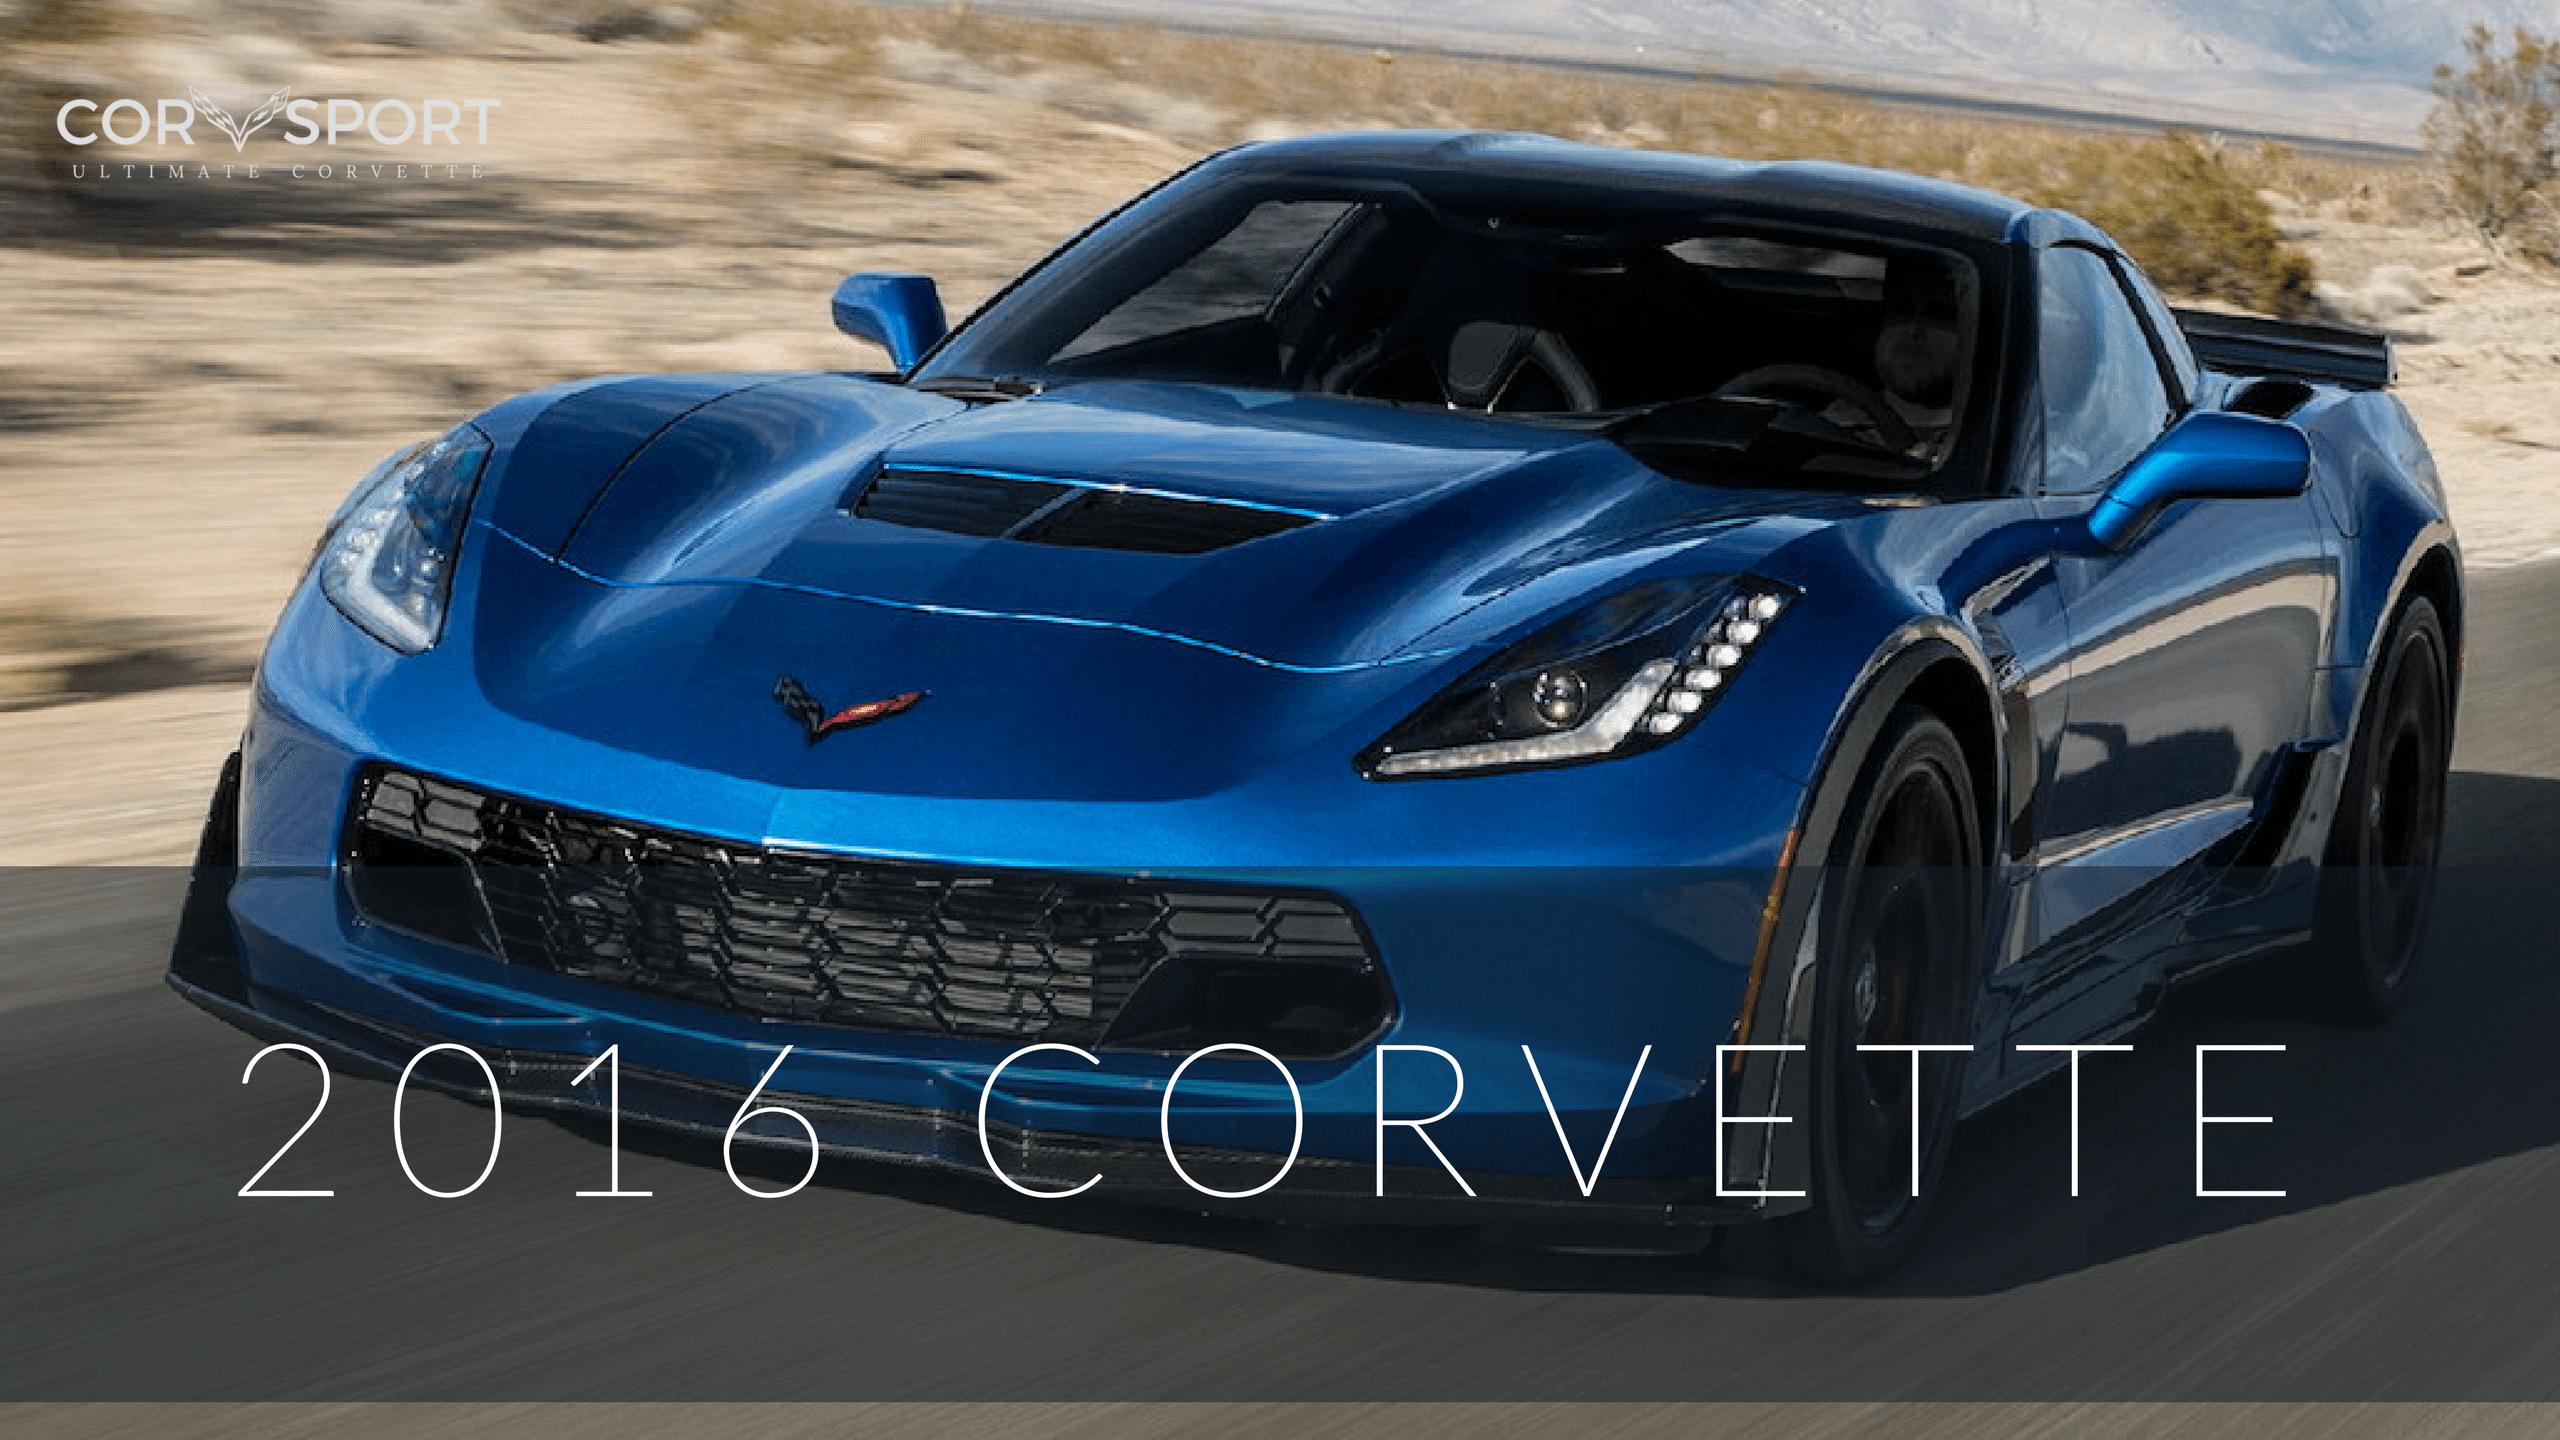 2016 Corvette Stingray Specs, Performance and Pics